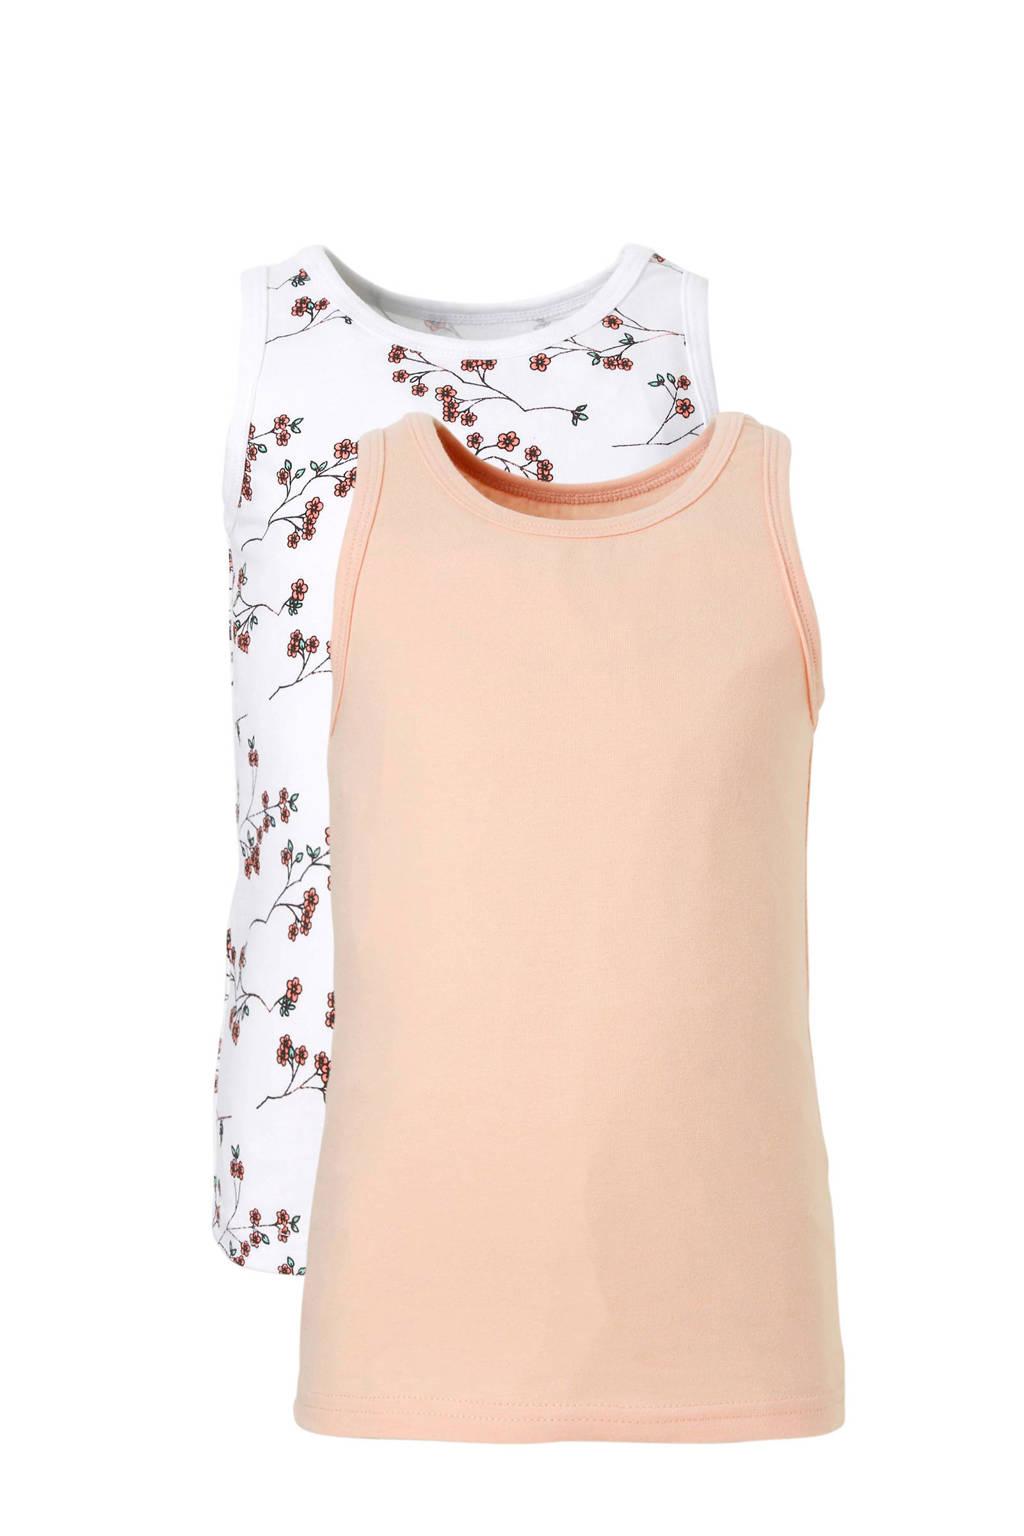 name it MINI hemd (set van 2), Licht/ roze/ wit